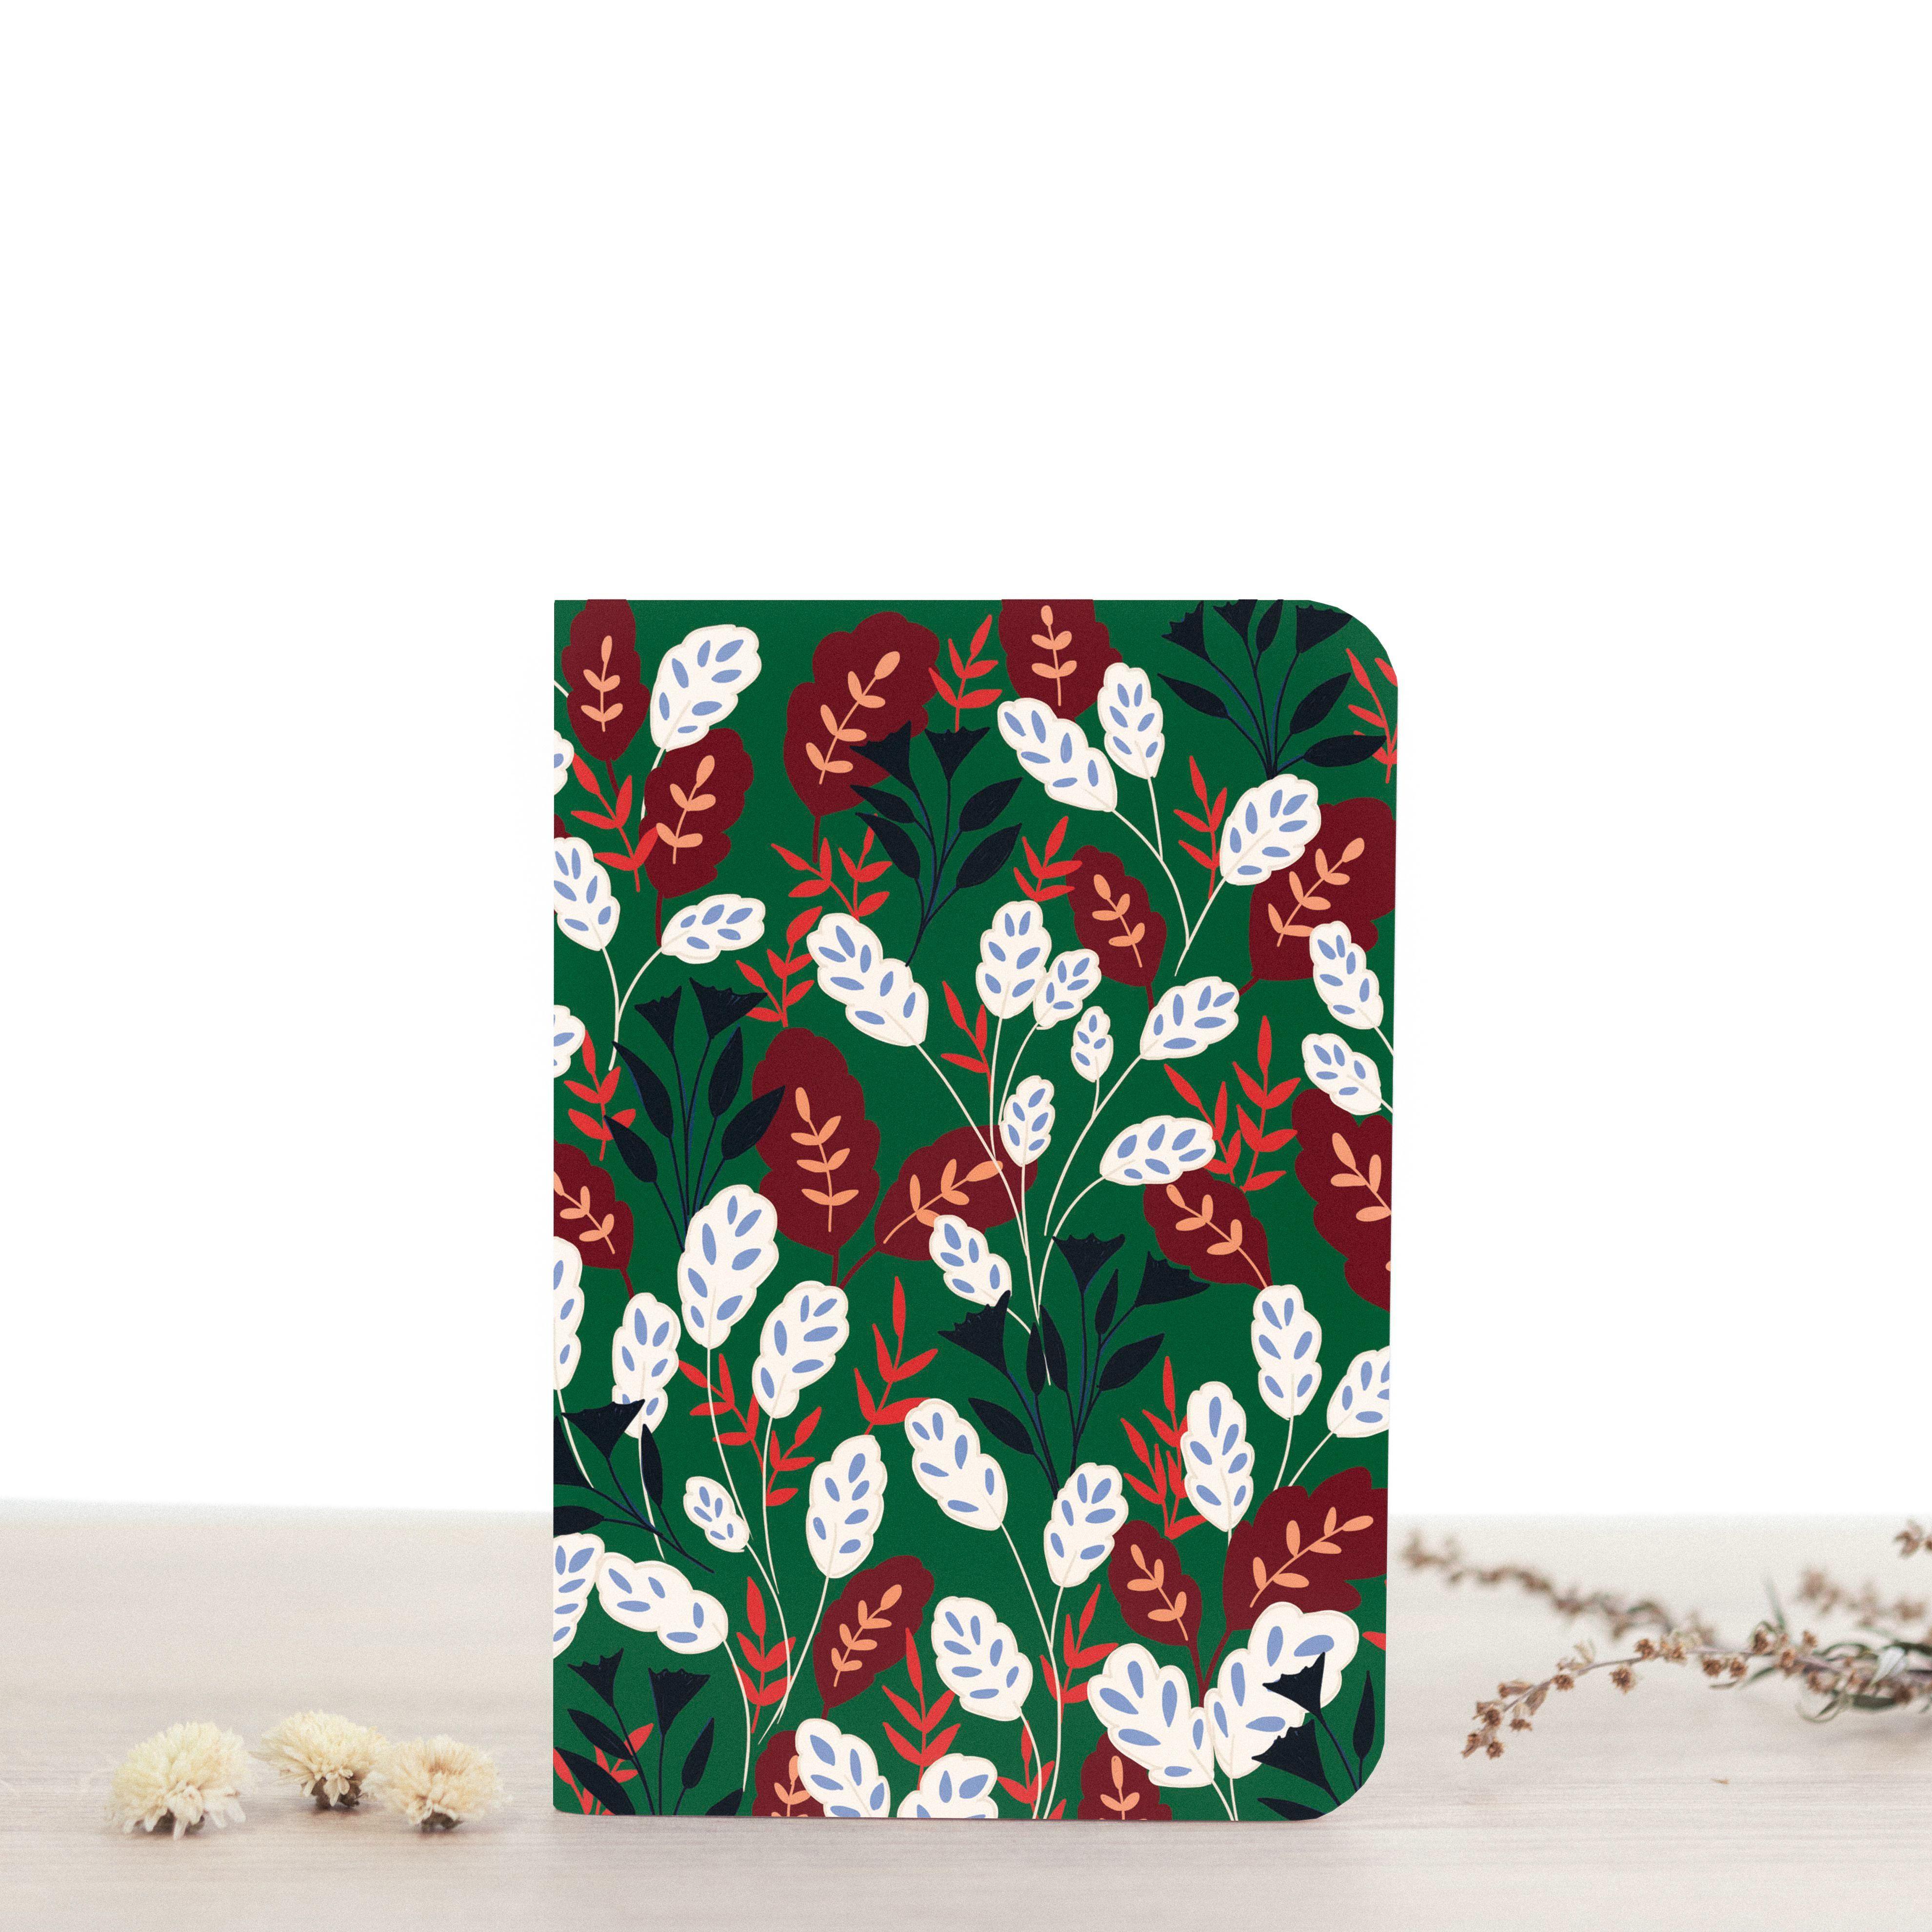 Atelier Bobbie A6 Notebook - Raphaelle - Rul